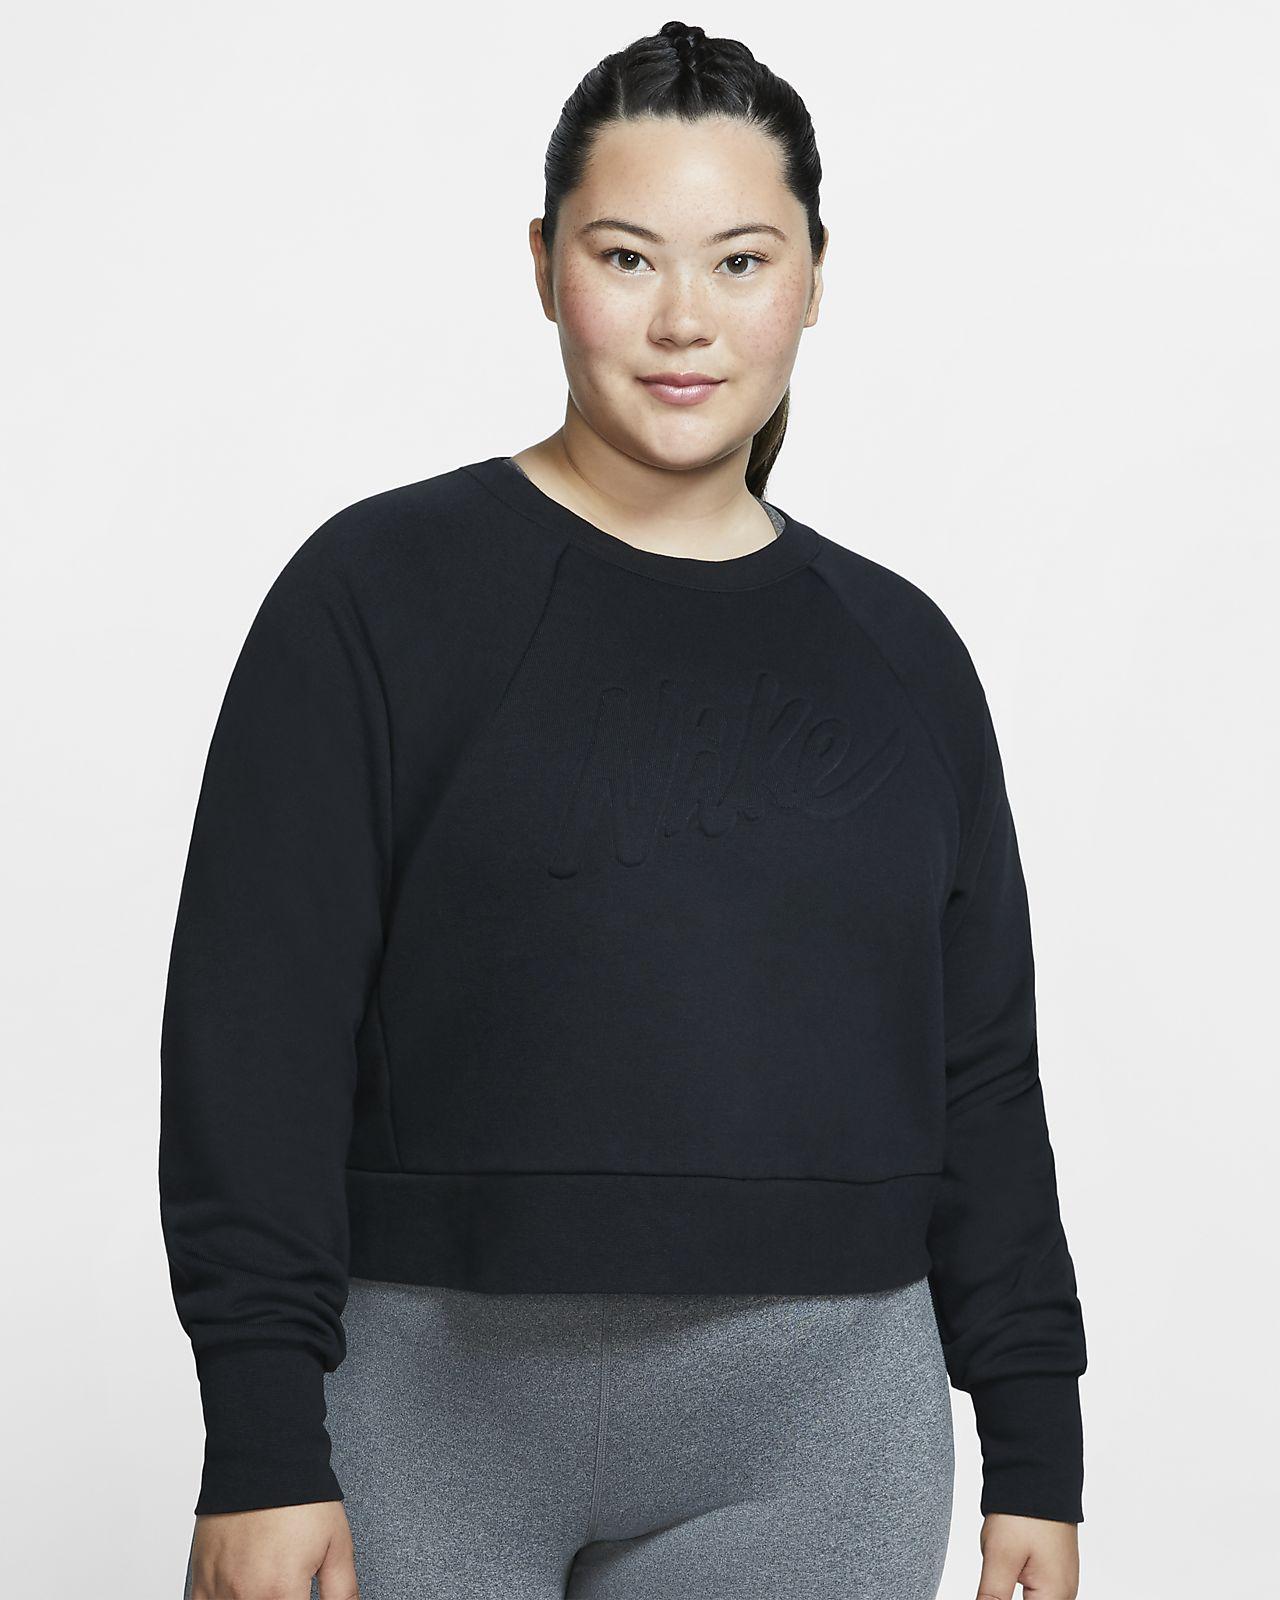 Nike Dri-FIT Luxe Langarm-Trainingsoberteil für Damen (große Größe)